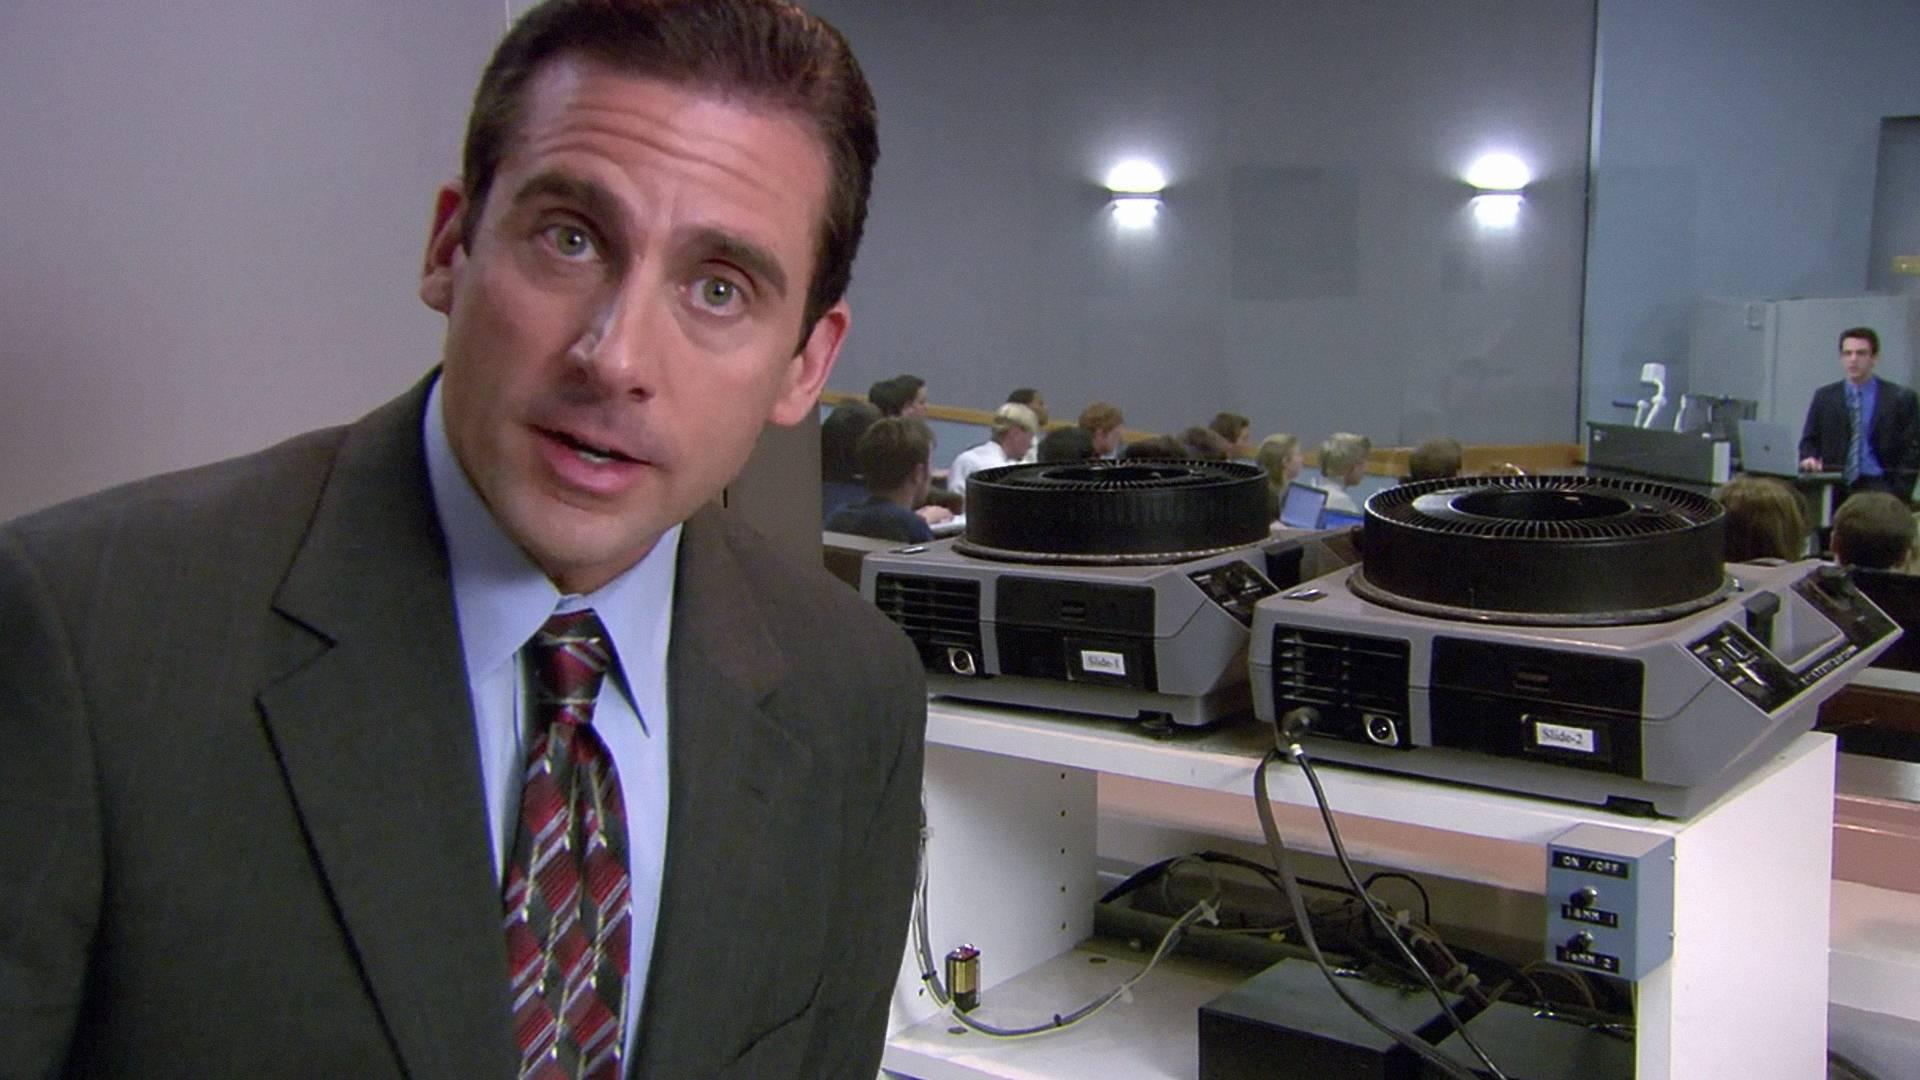 The Office Season 3 Episode 17